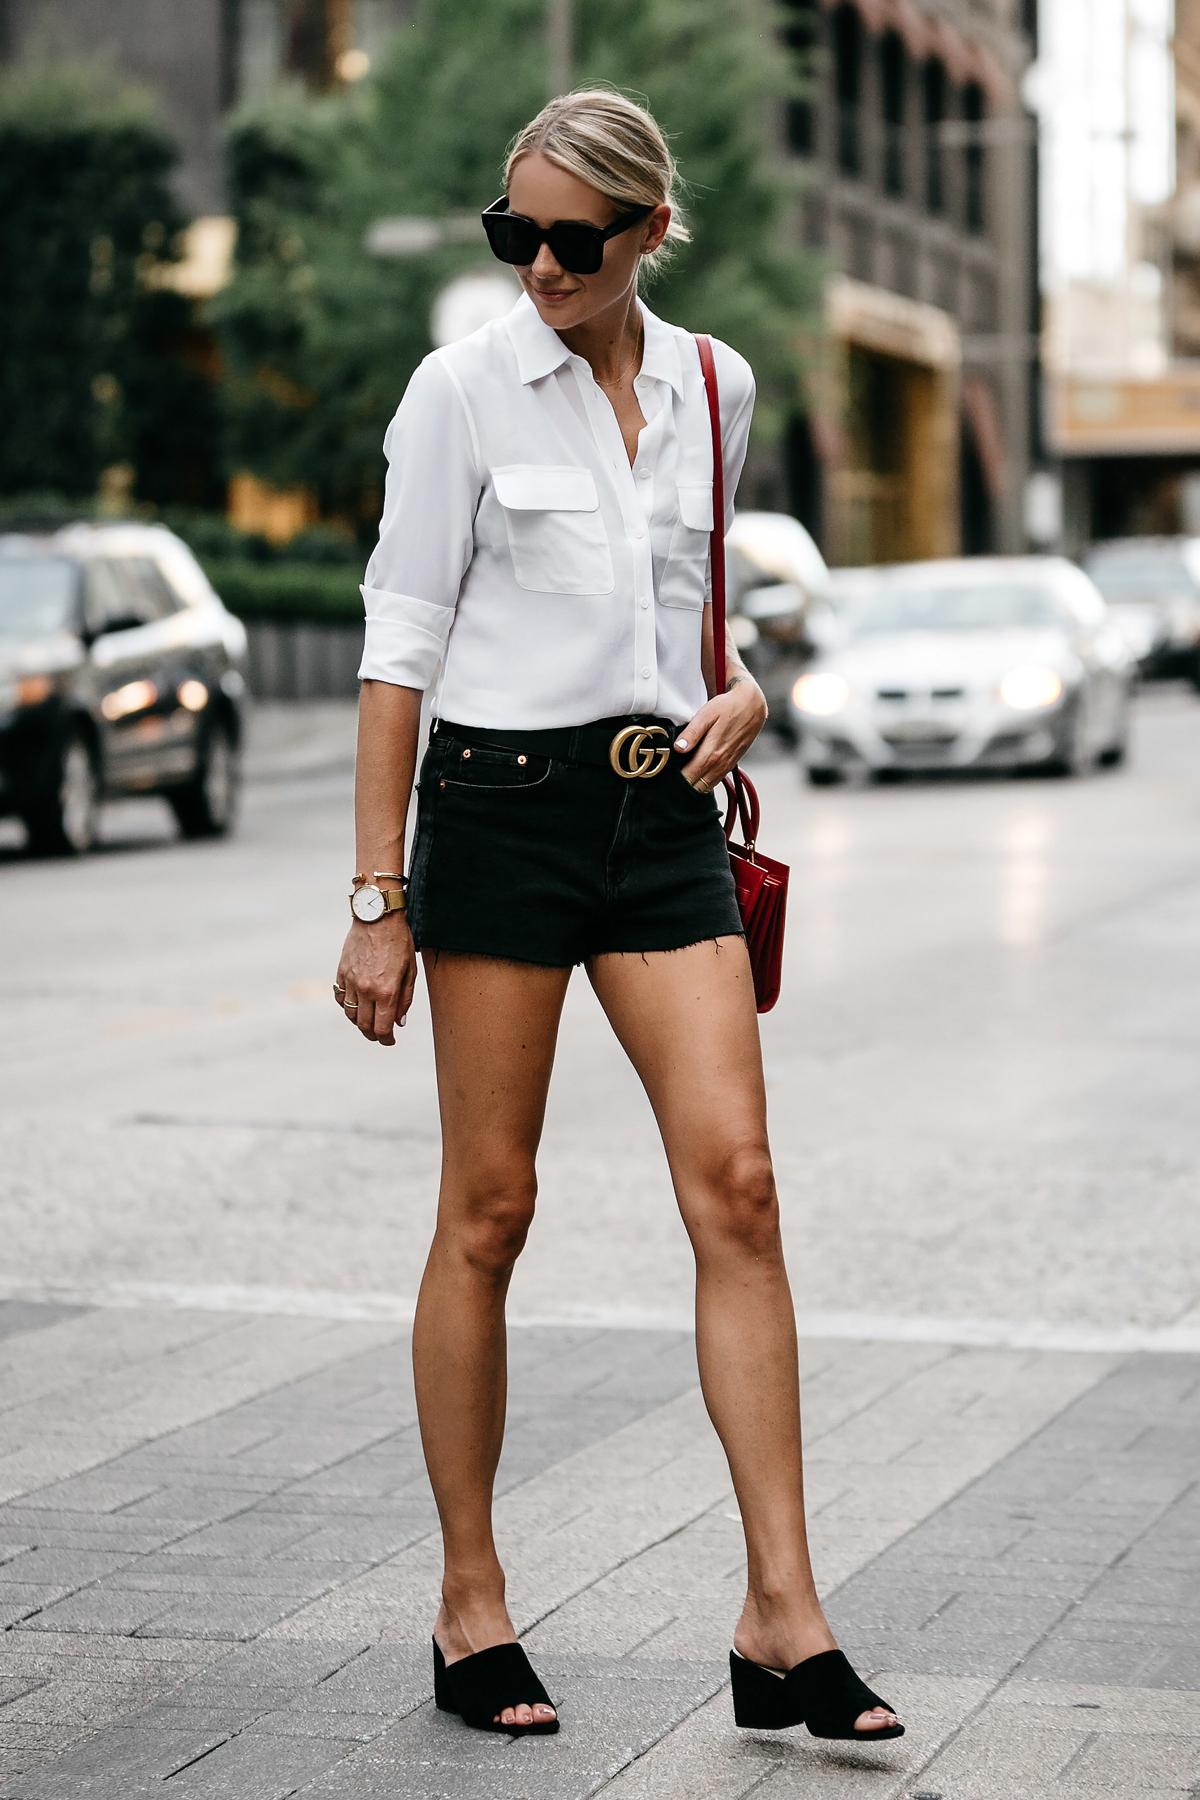 Blonde Woman Wearing White Button Down Shirt Black Denim Shorts Outfit Saint Laurent Sac De Jour Red Handbag Black Mules Gucci Marmont Belt Fashion Jackson Dallas Blogger Fashion Blogger Street Style